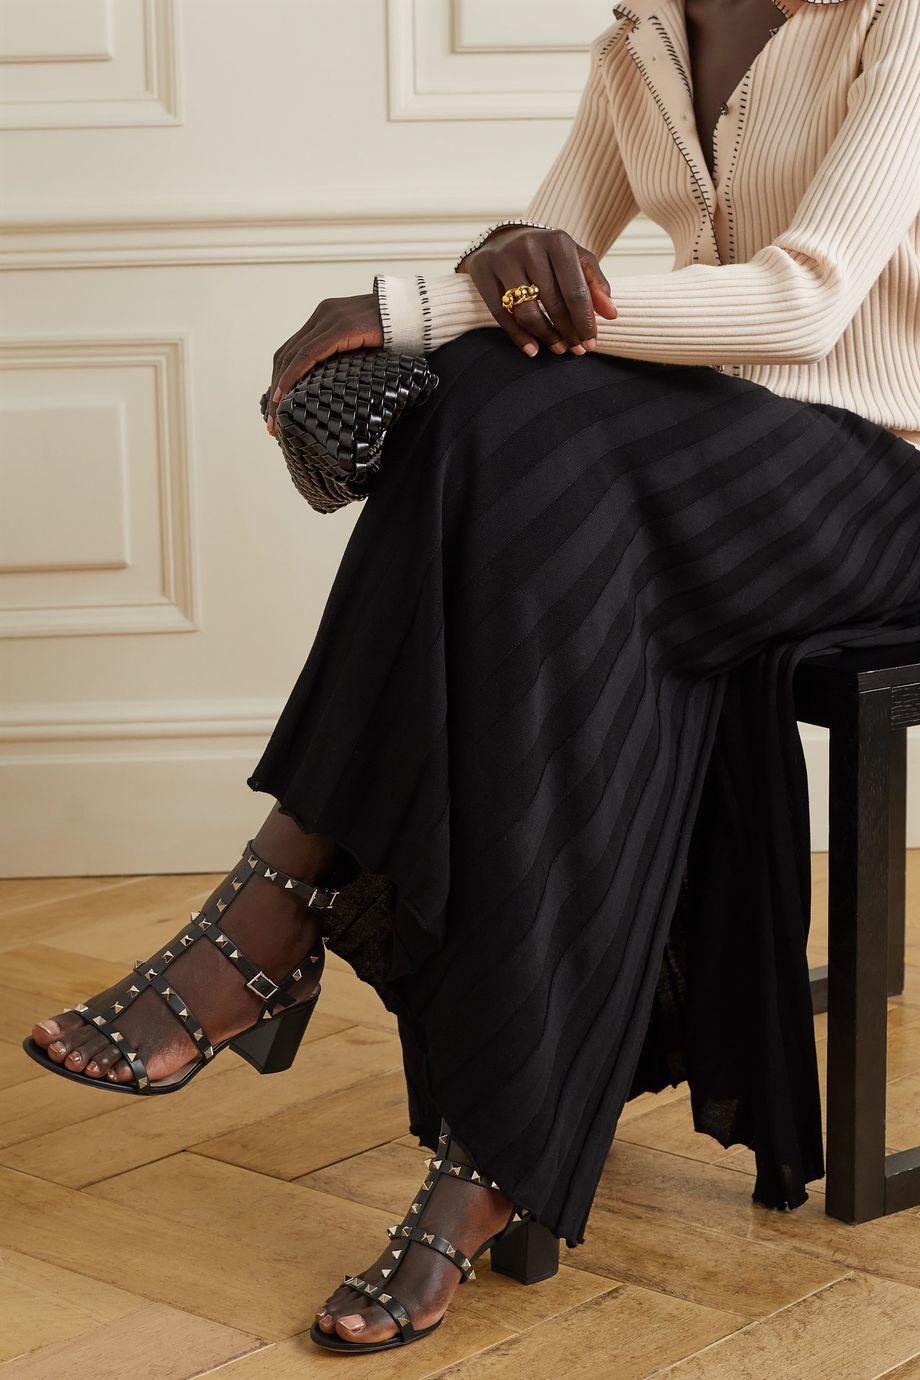 Valentino Valentino Garavani Rockstud 60 leather sandals